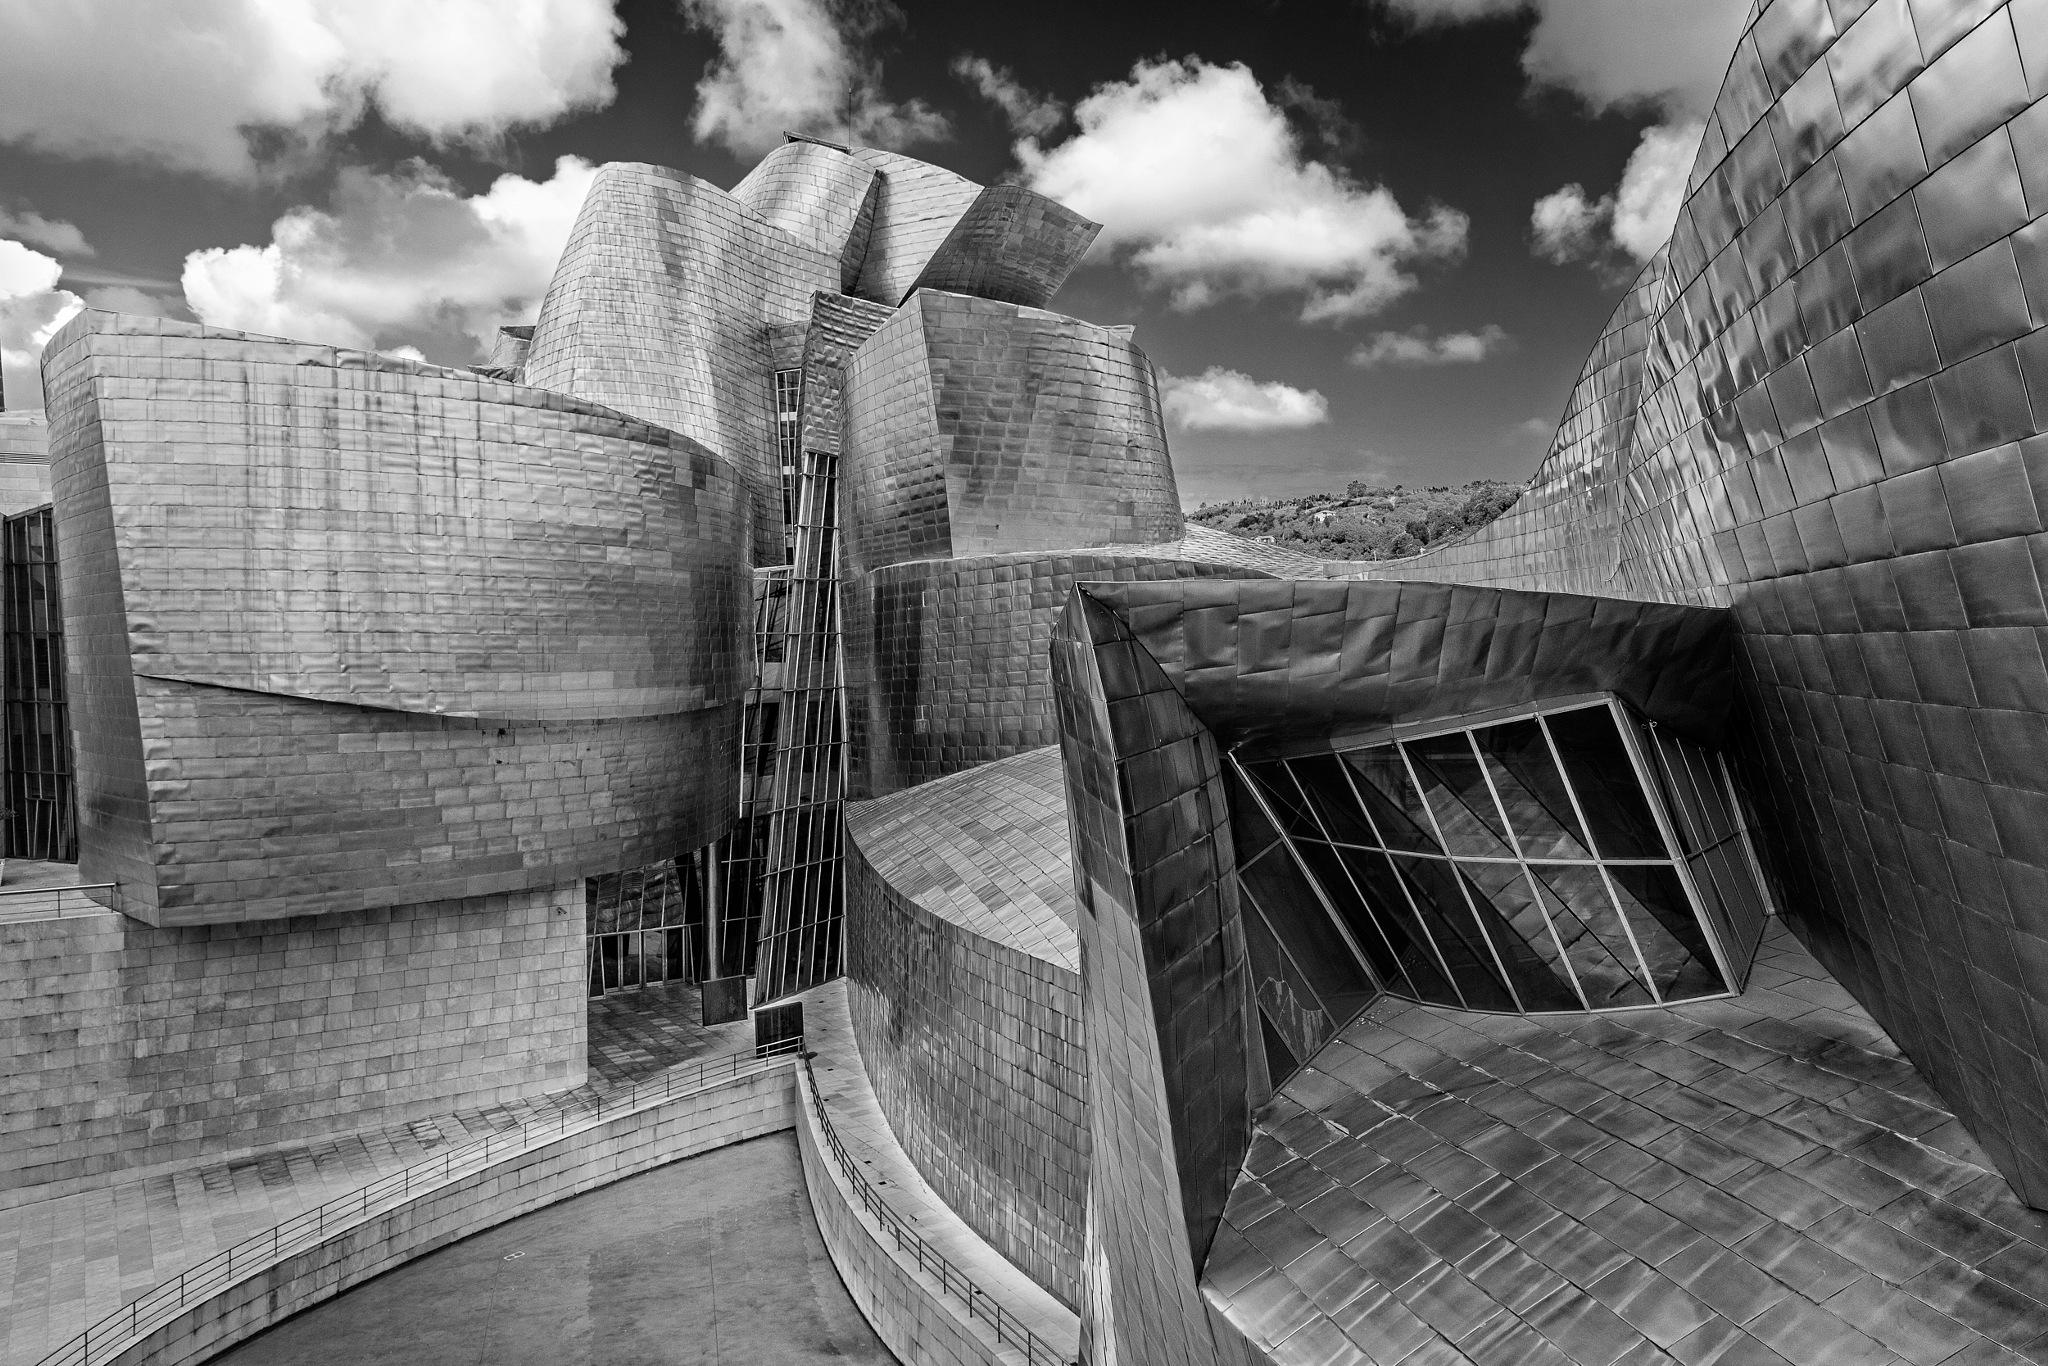 Guggenheim Museum, Bilbao by Steve Director